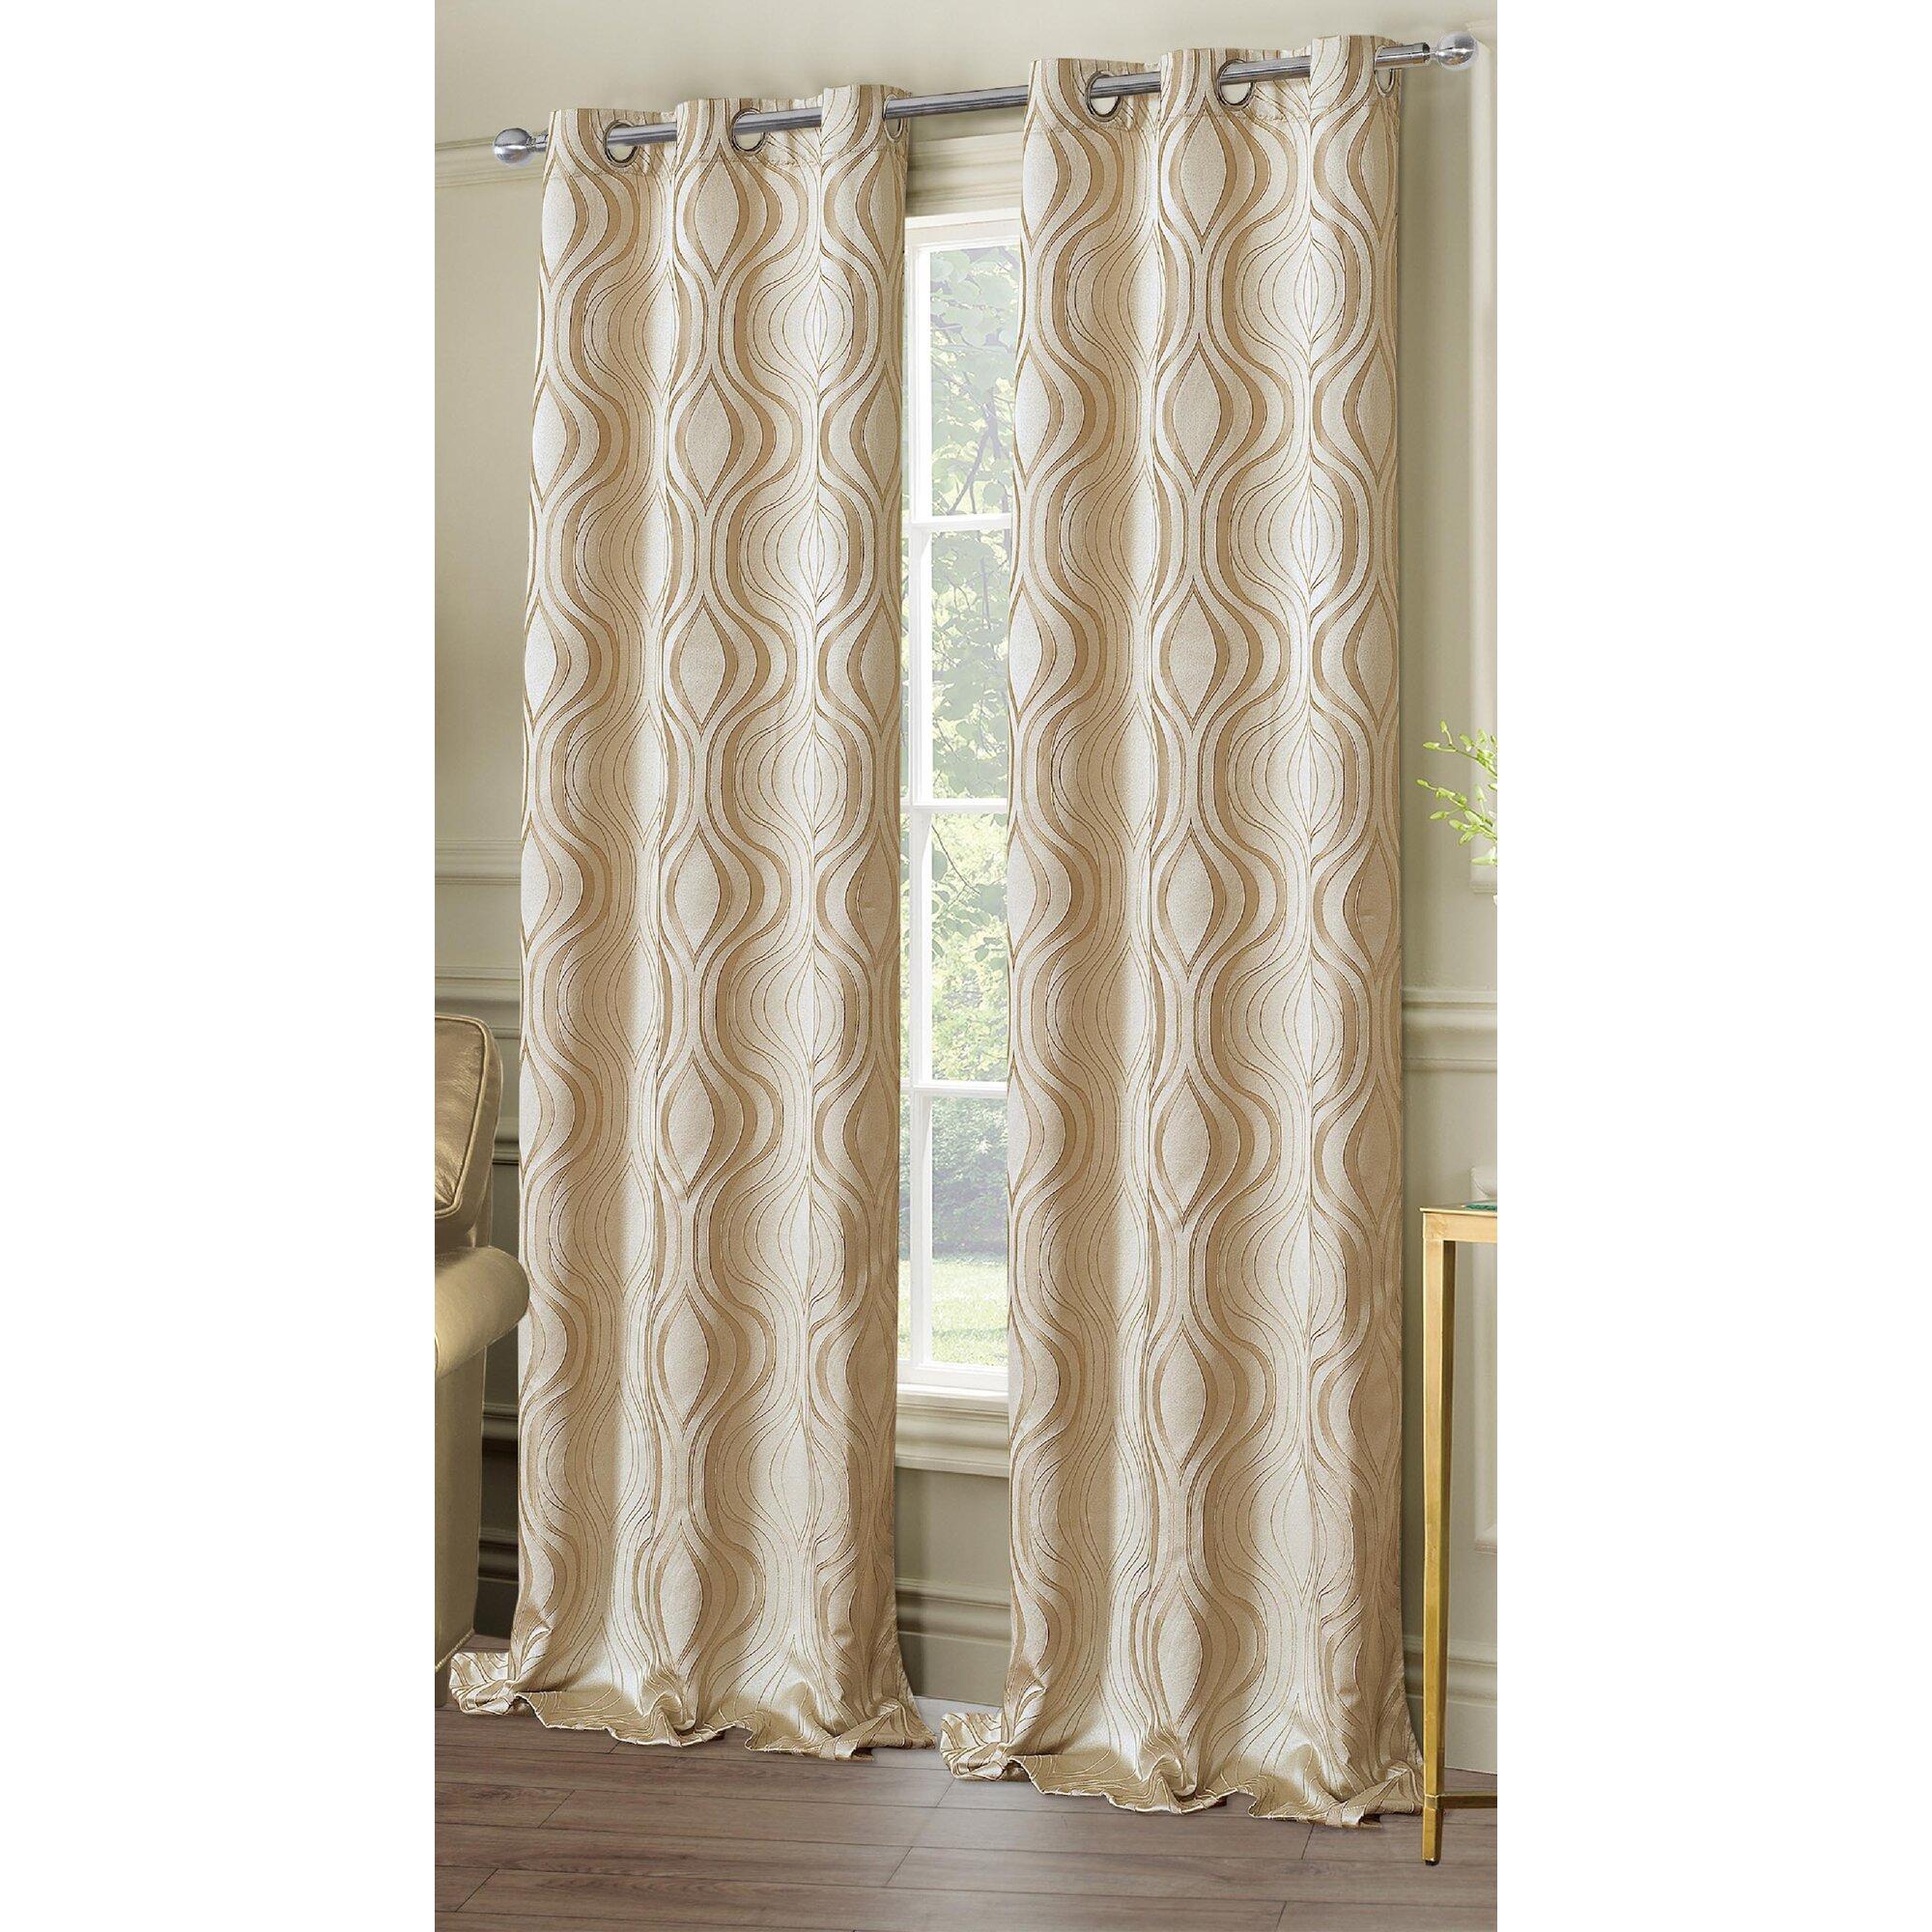 Dainty Home Symphony Geometric Semi Sheer Grommet Curtain